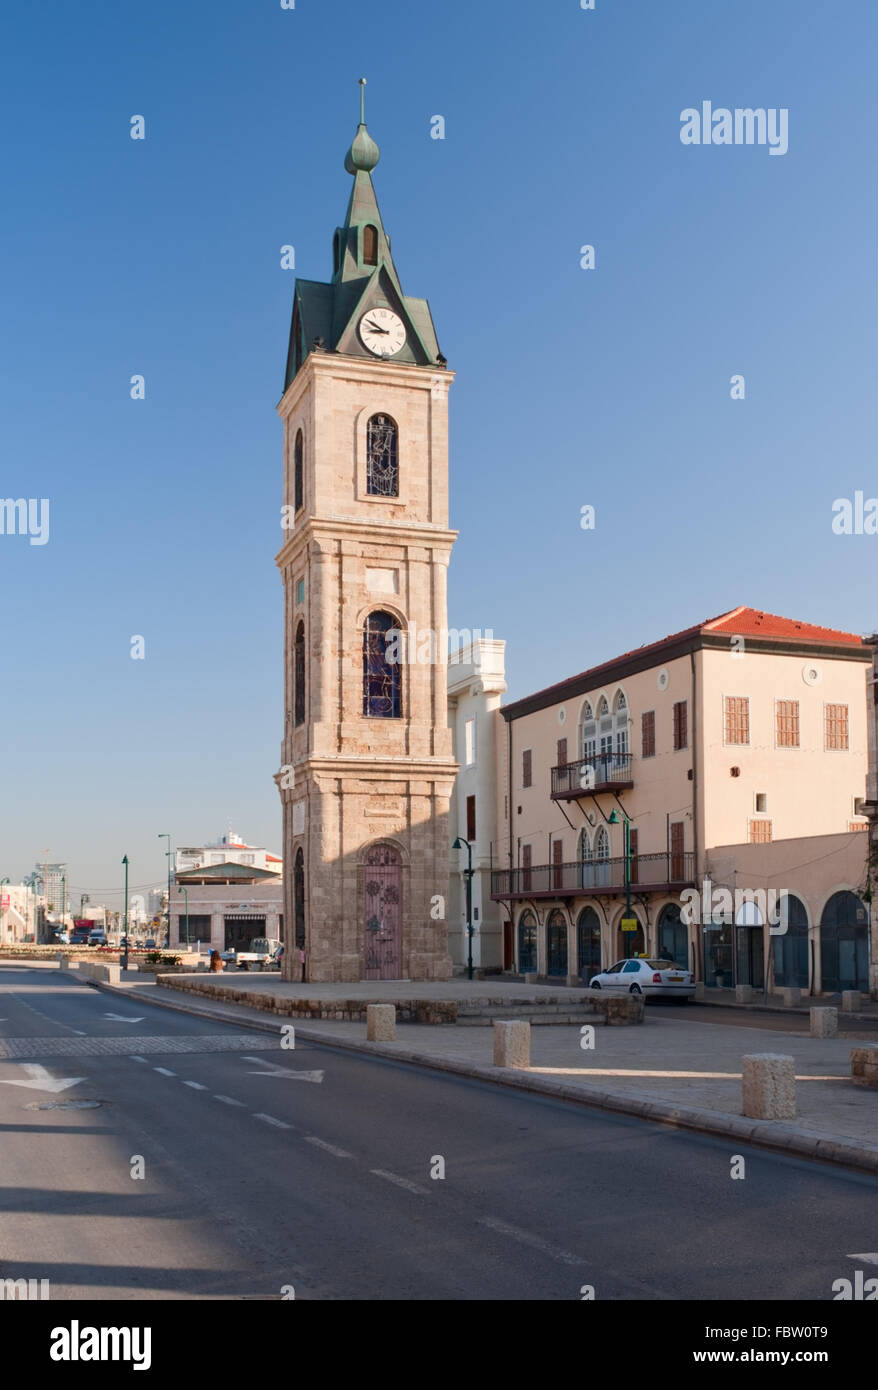 Jaffa Clock Tower - Stock Image